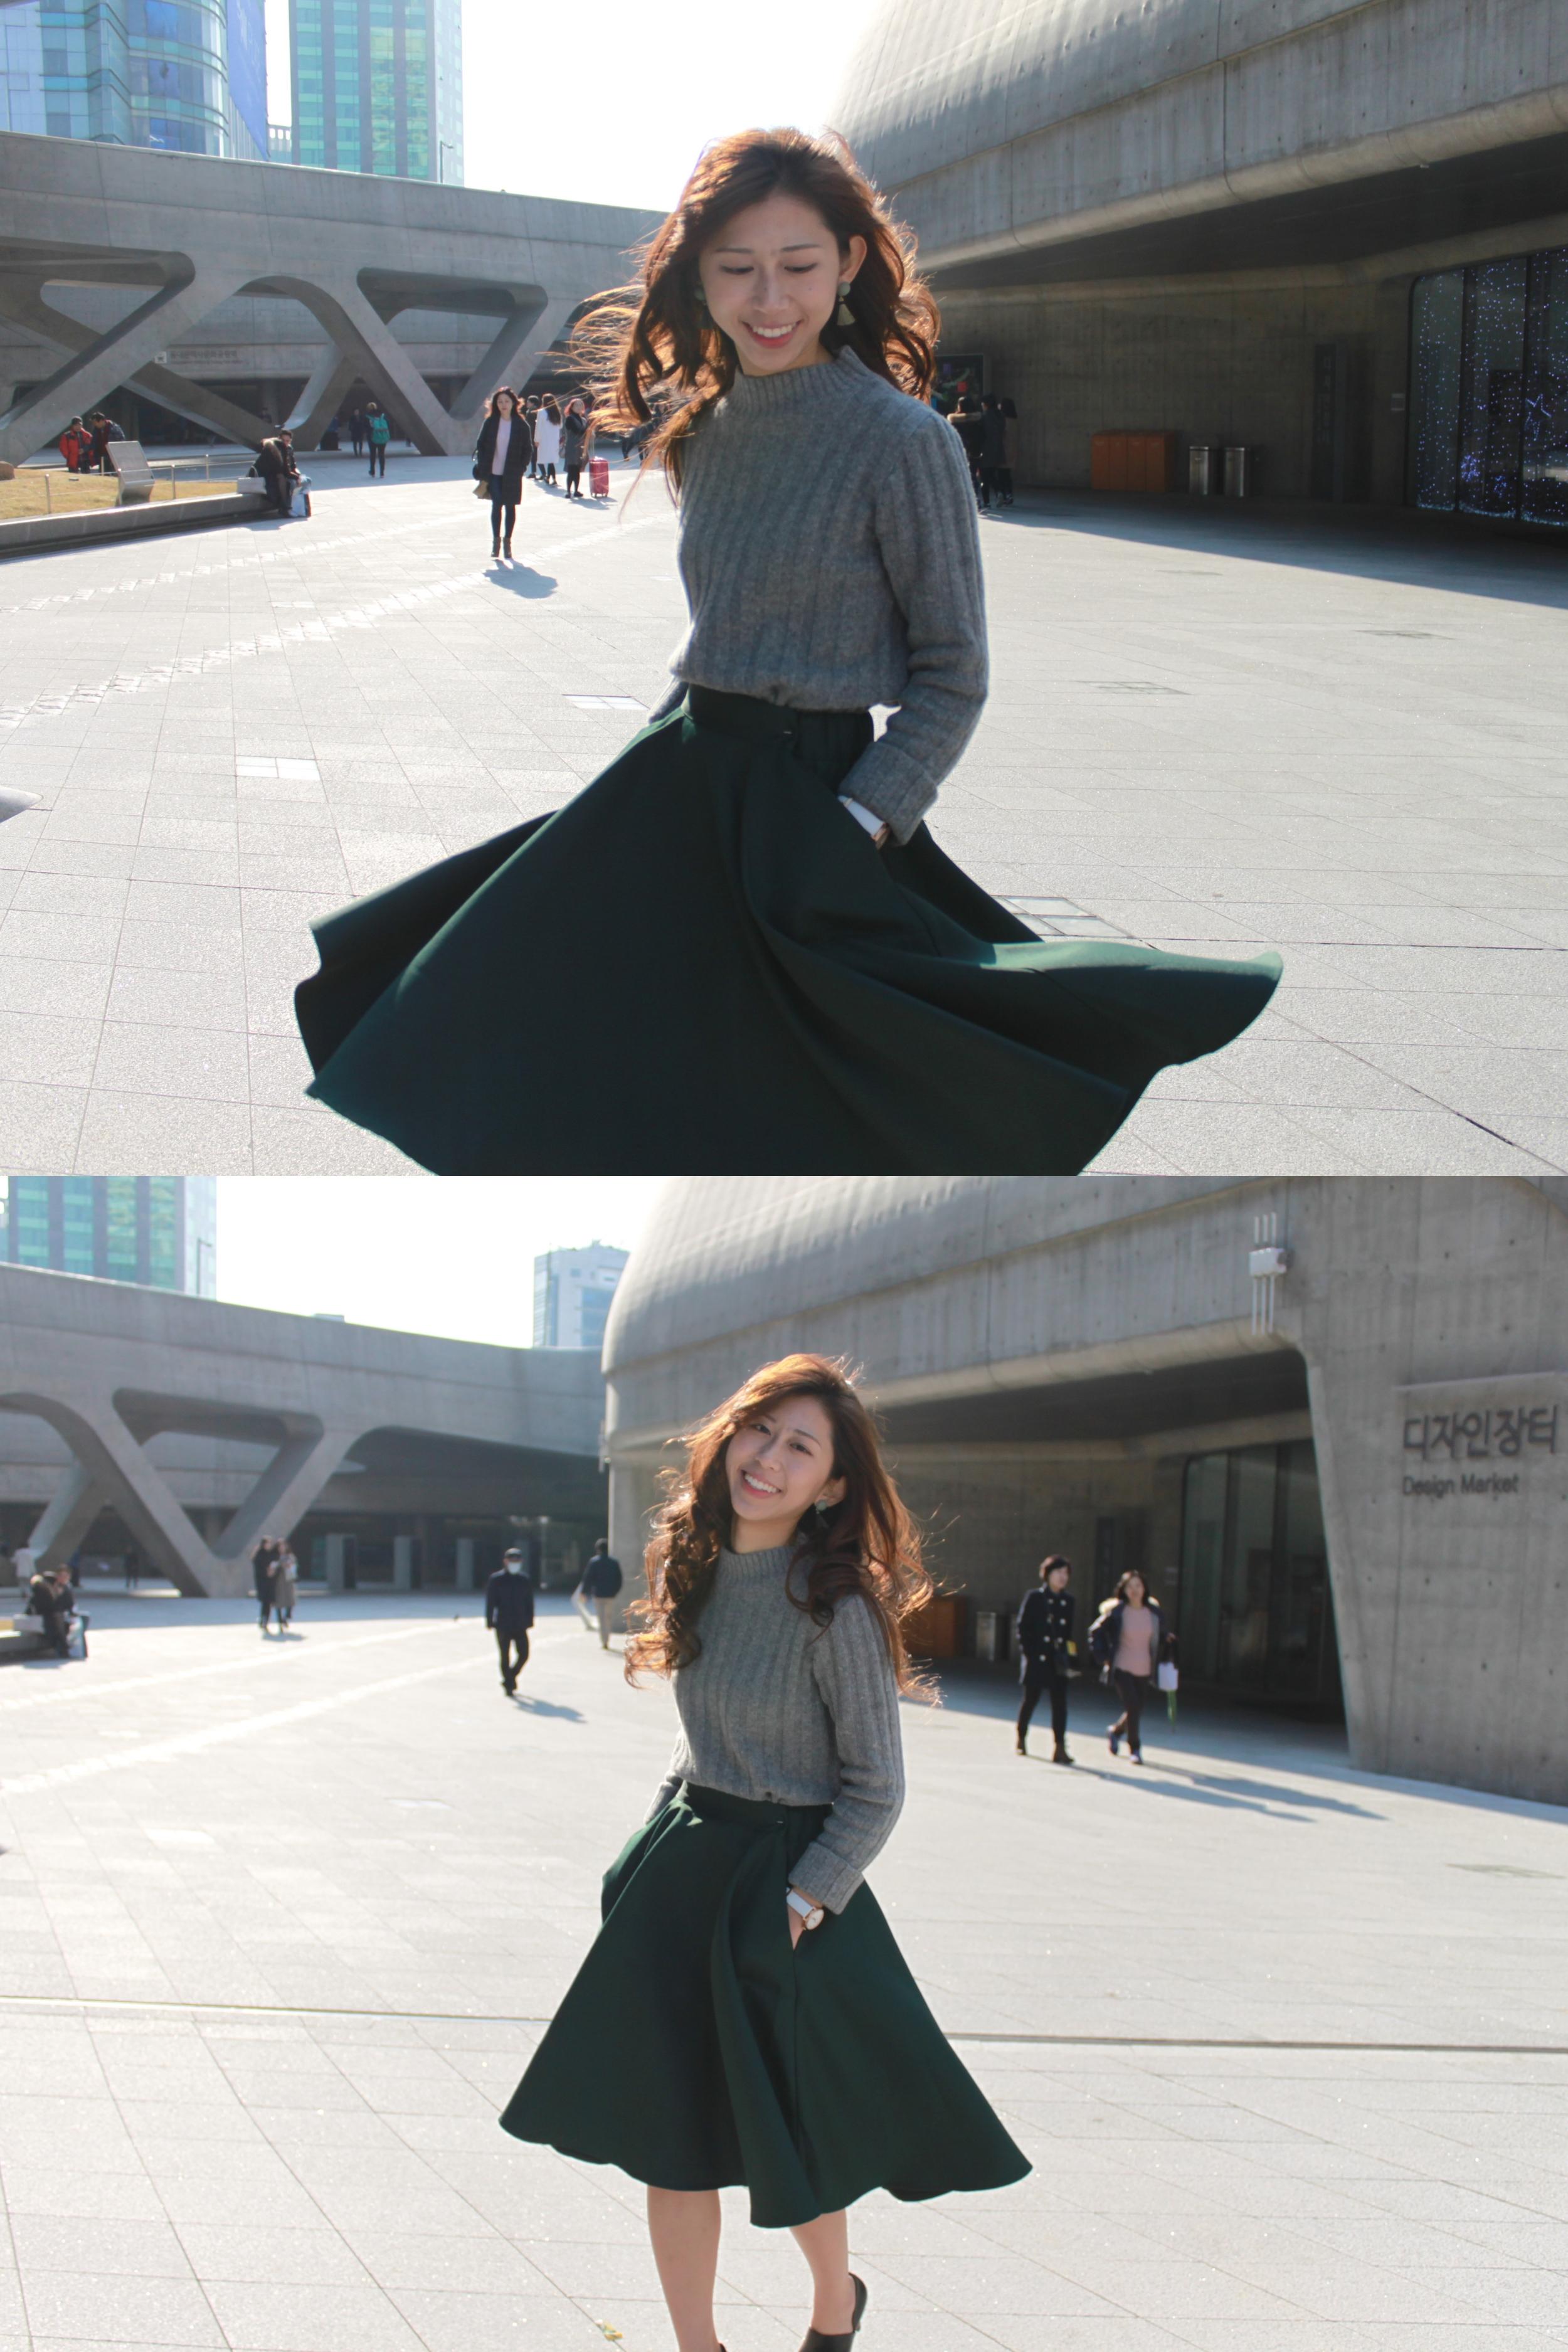 Korea grey Sweater Top / Amber (HK) green midi-skirt / DearPostman green earrings #001 /  Staccato black cut-out pointed heels